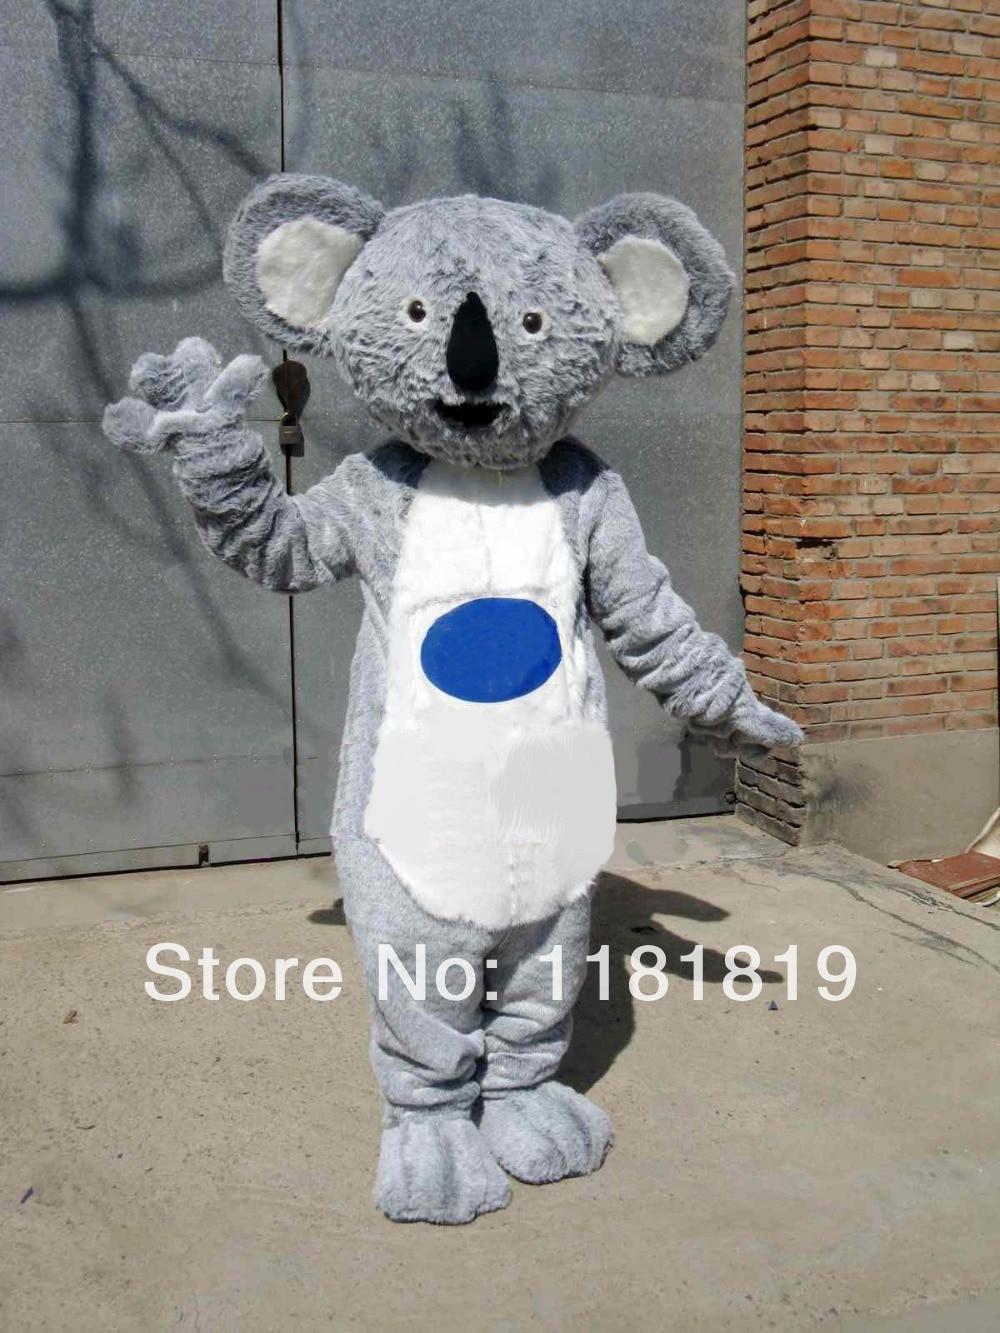 ₪Mascotas Koala Mascotas traje de Halloween venta caliente personaje ...